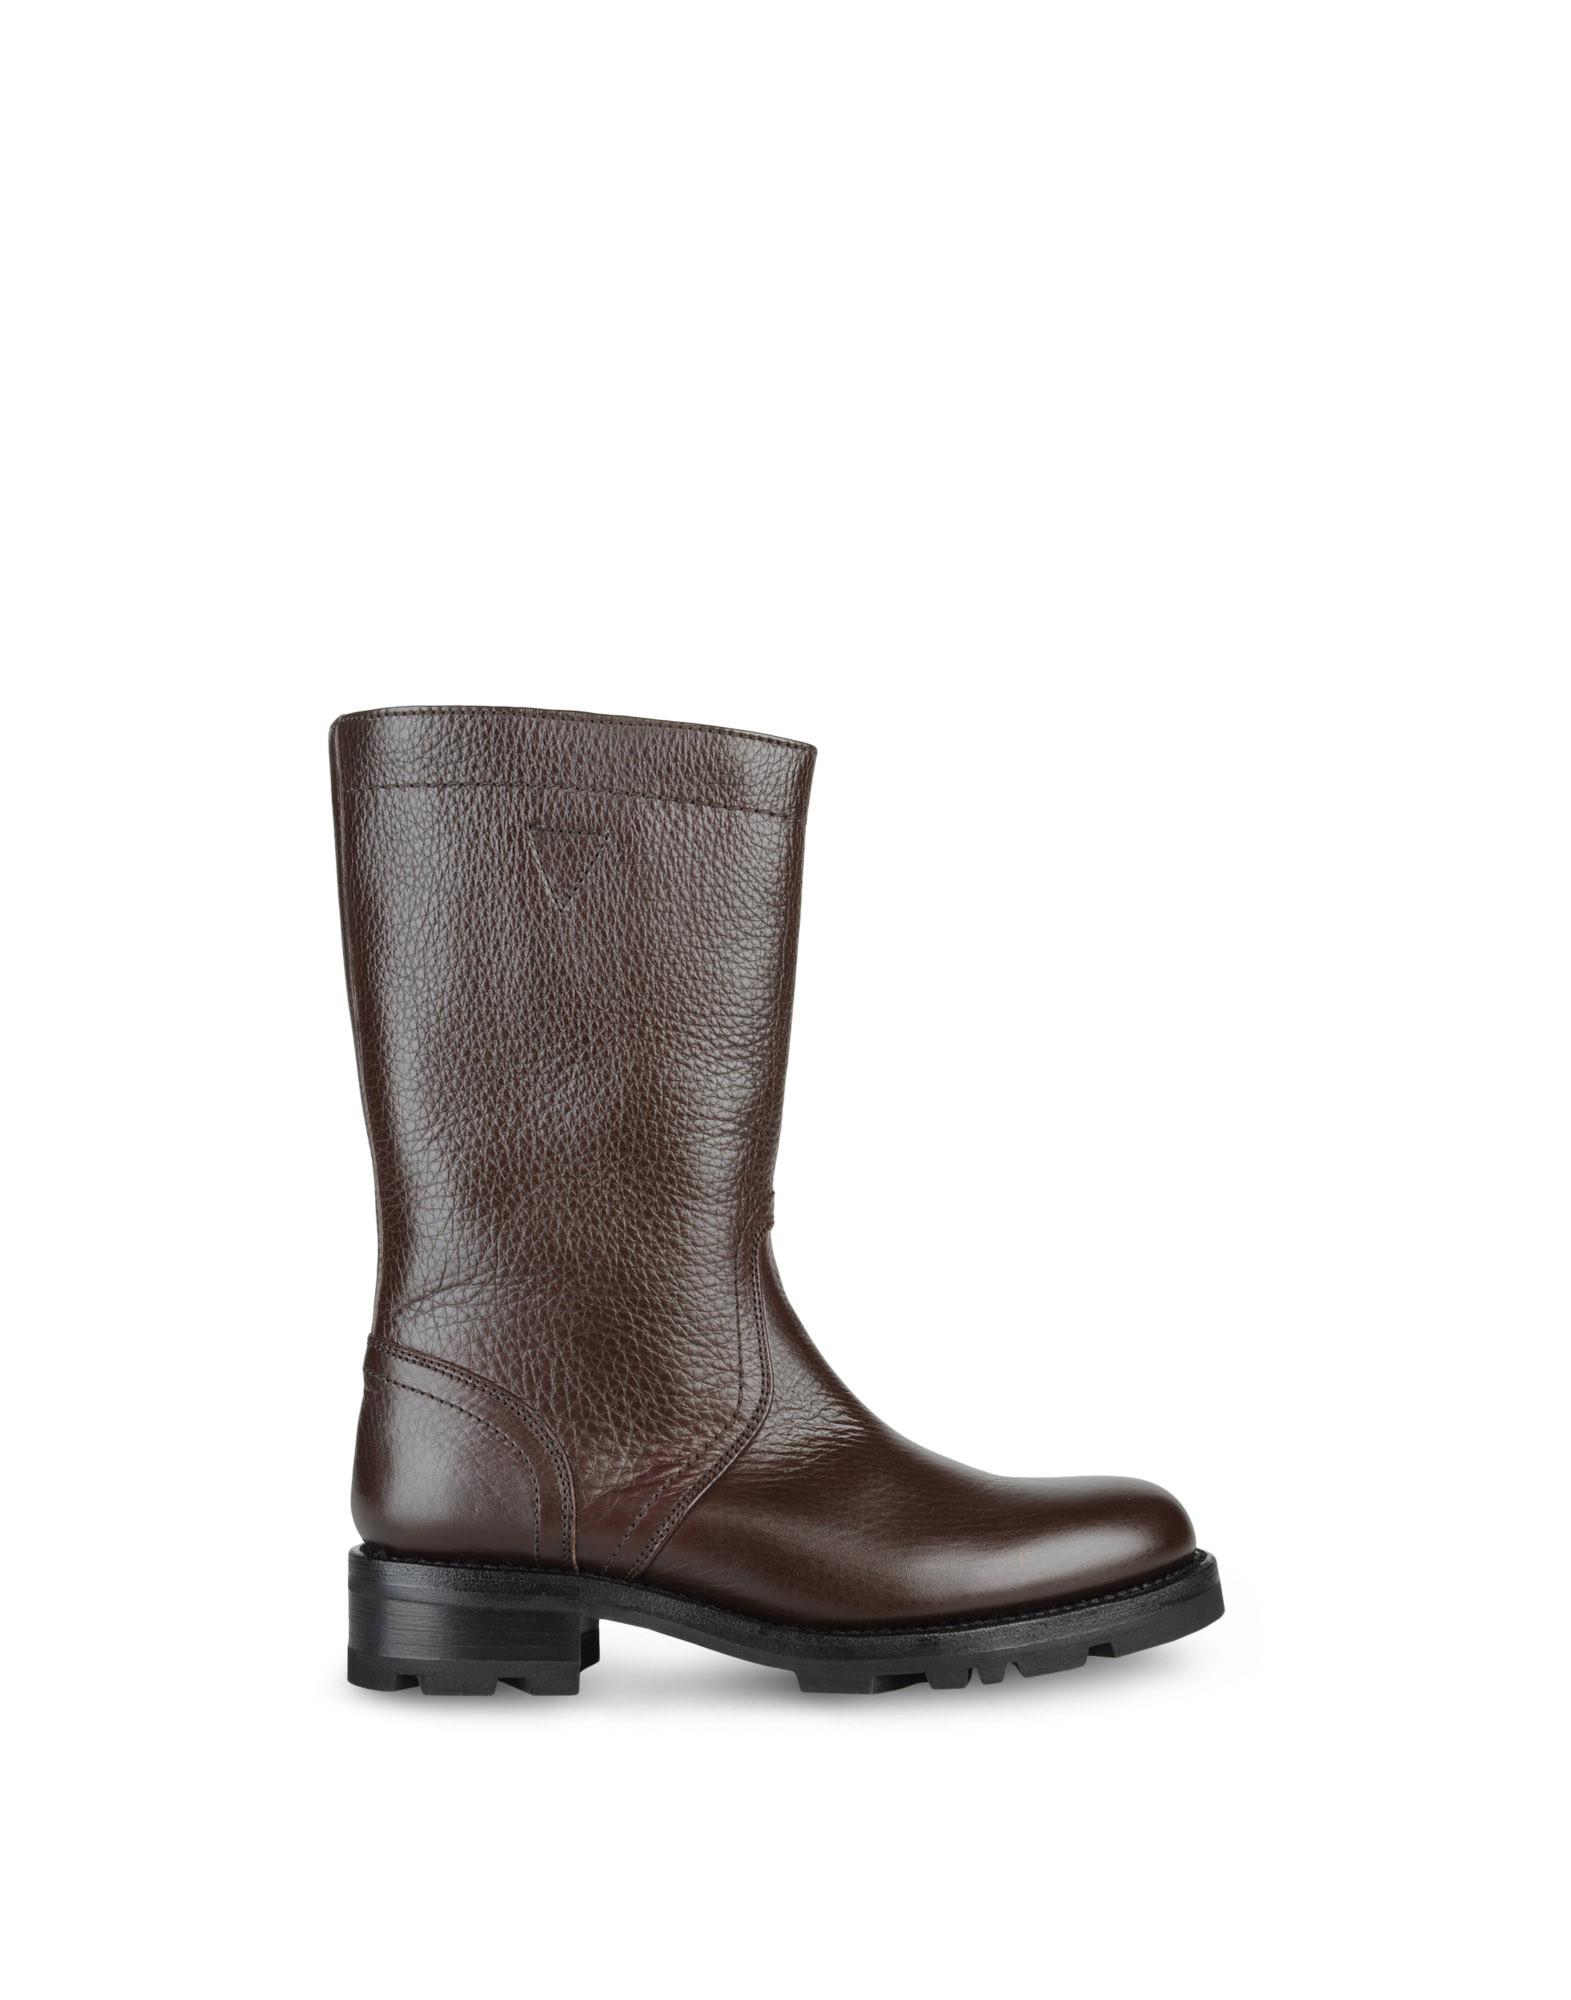 Stiefel - JIL SANDER Online Store